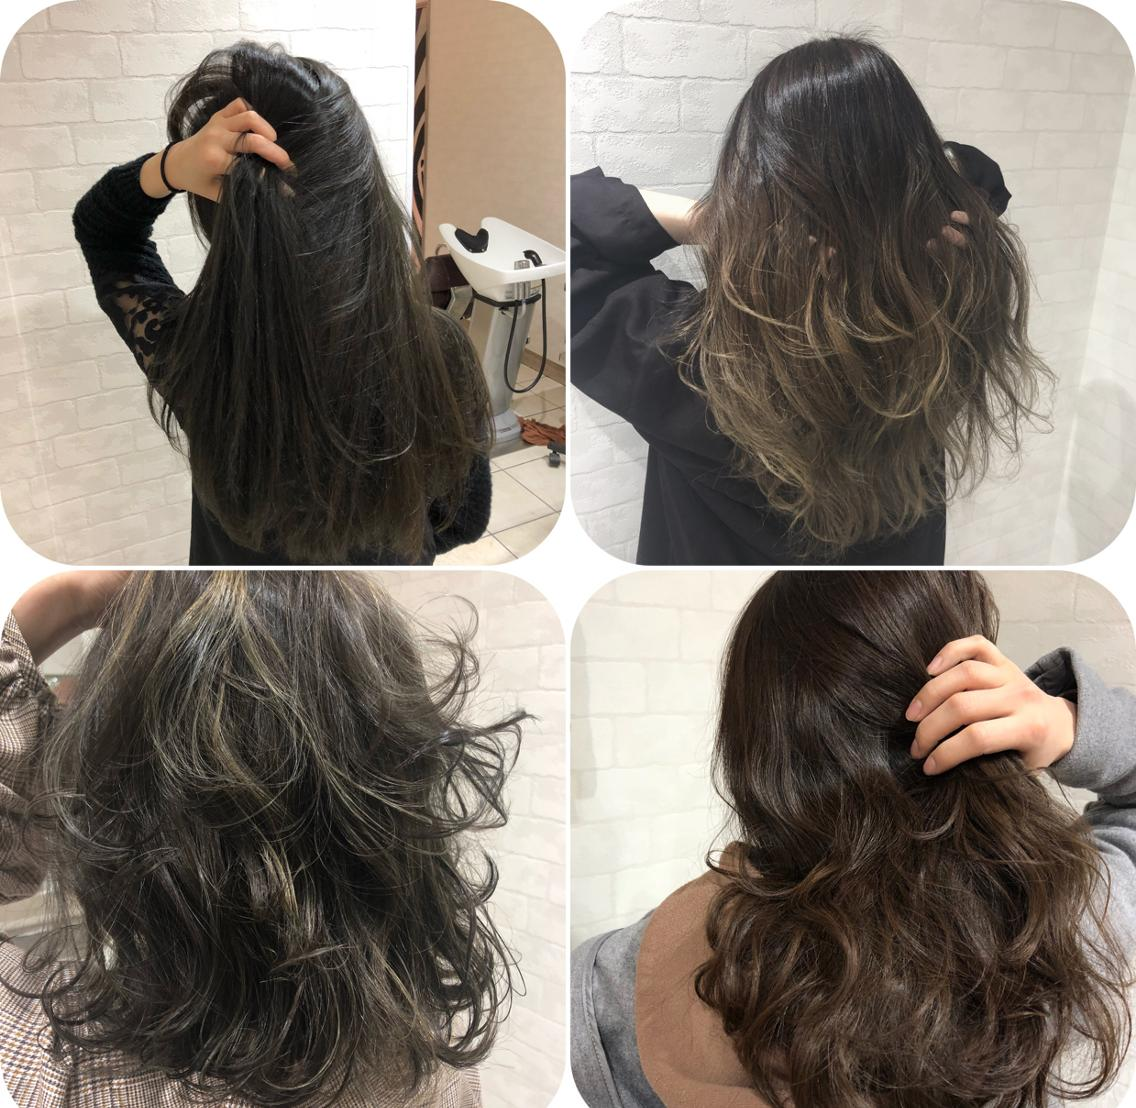 HAIR&MAKEEARTH天満橋店所属・浜川紗耶佳の掲載